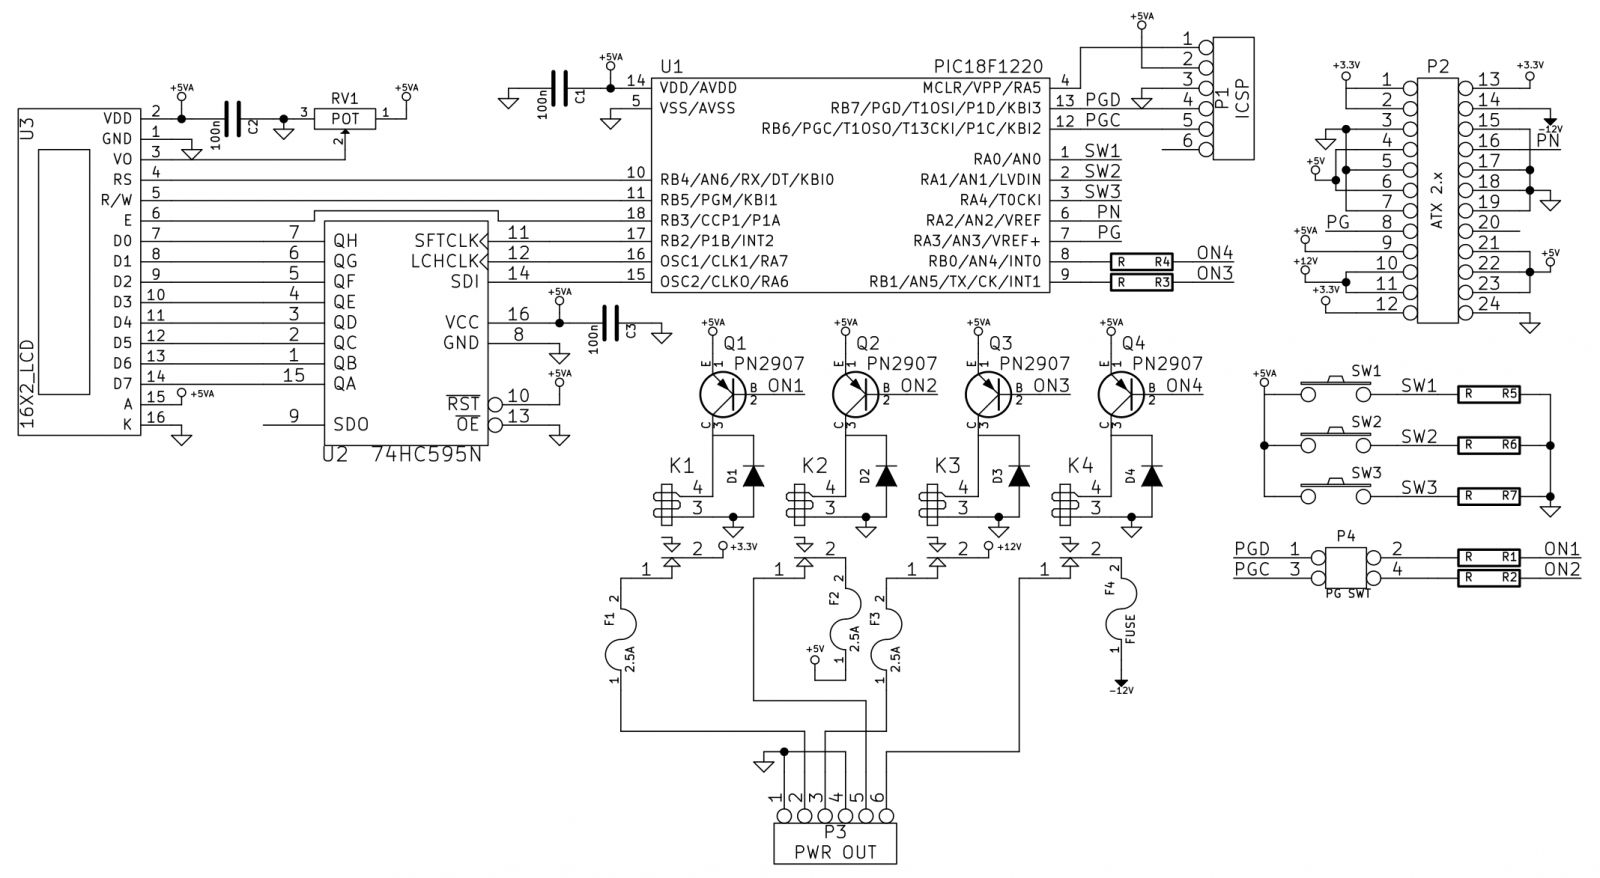 Cpu Power Supply Mod Supercap2fs Website Circuit Diagram Of A Schematic